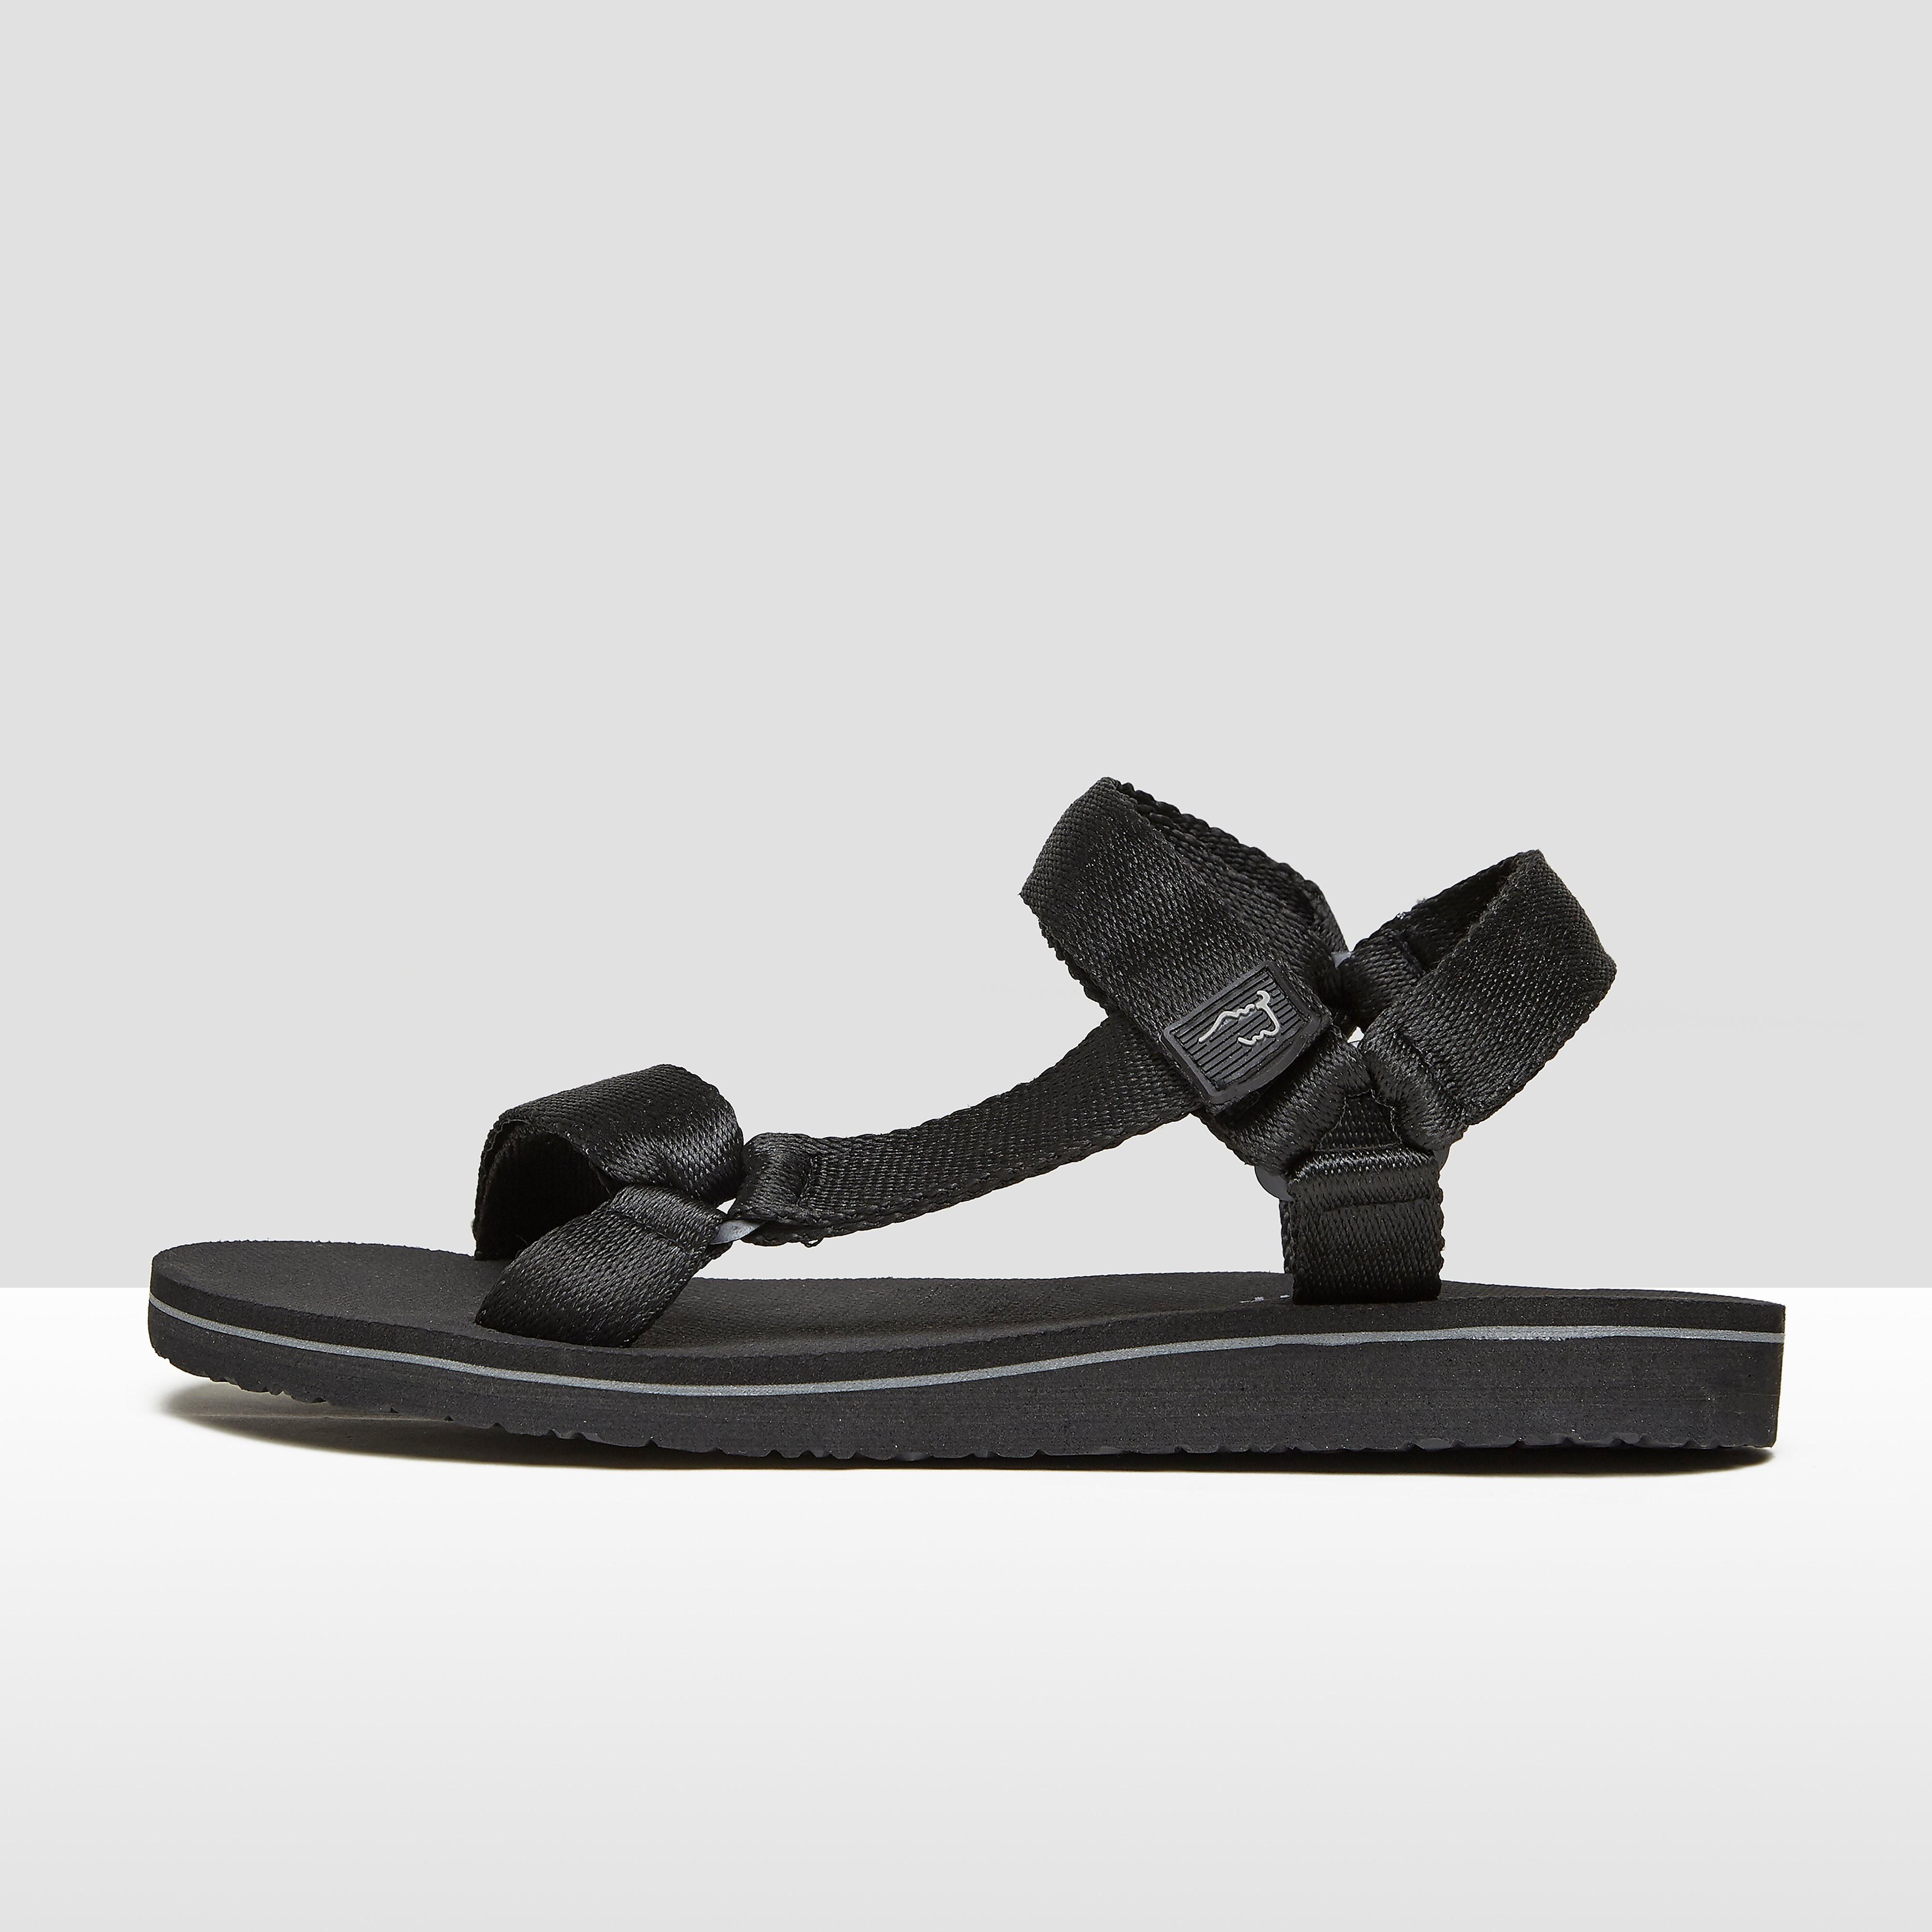 Mens Kapalua Sandalen Zwart Heren - Black. Size - 46 thumbnail